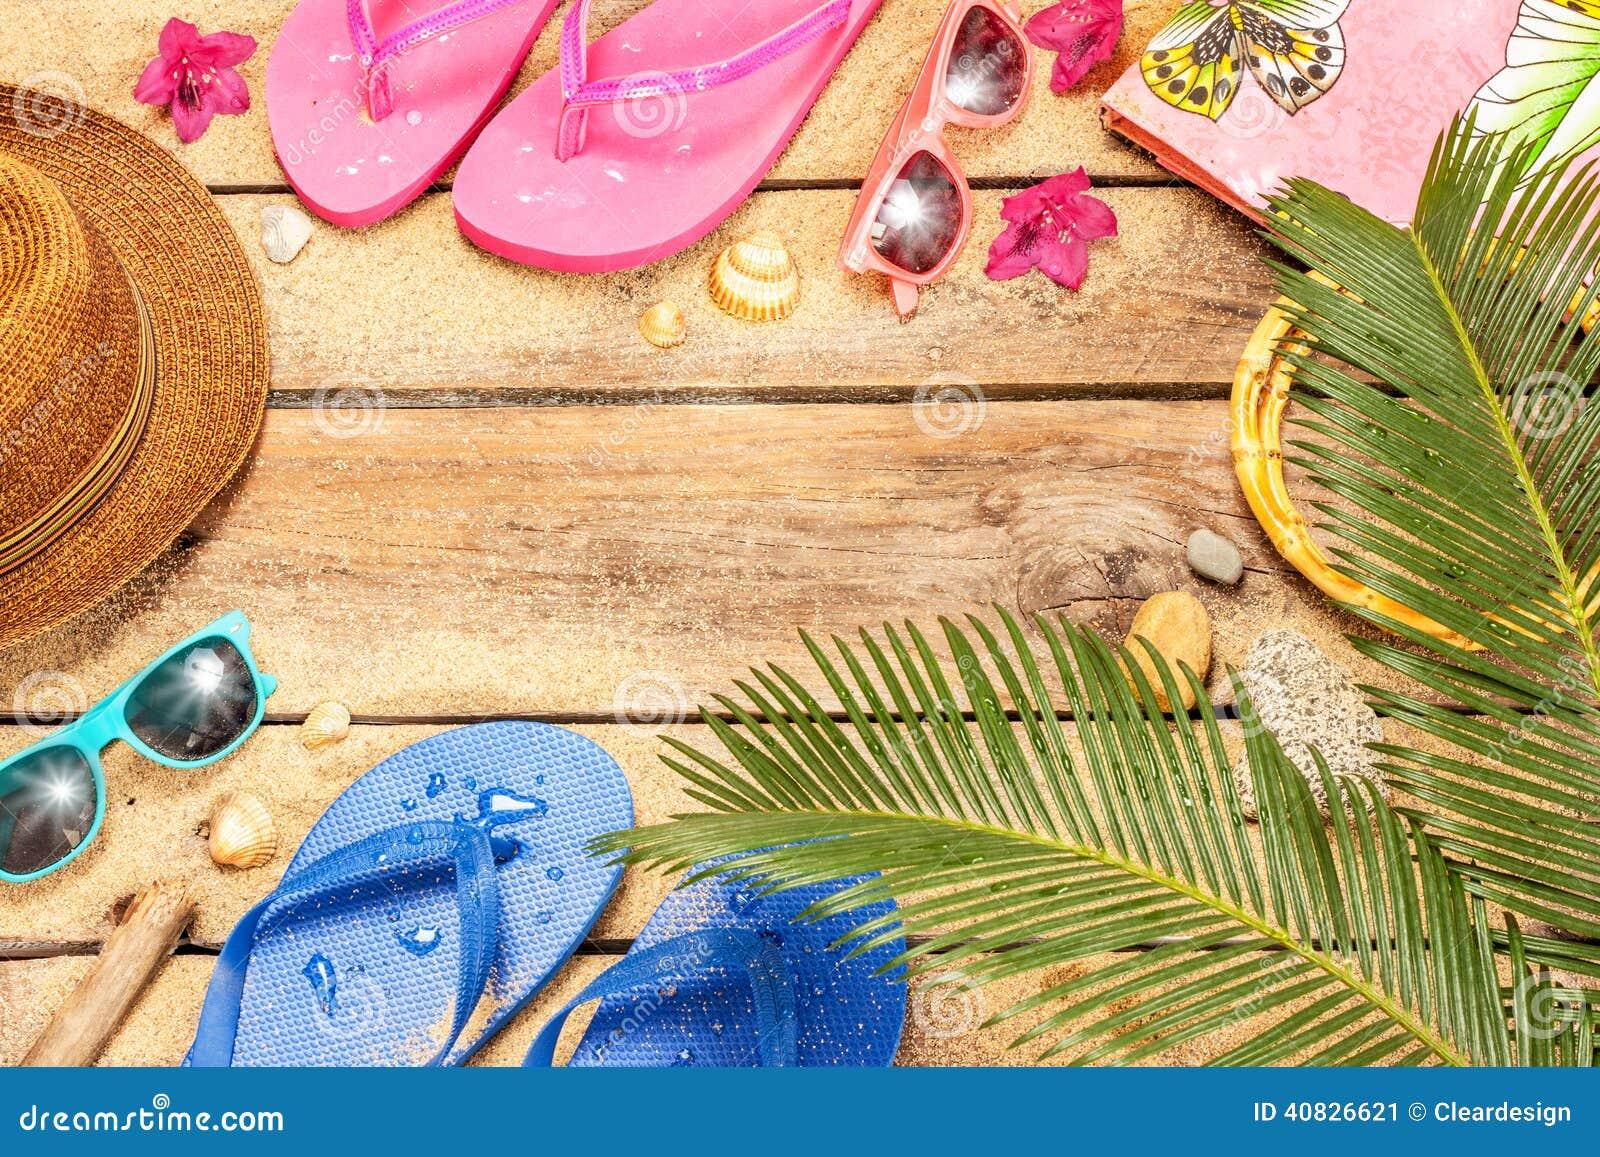 beach  palm tree leaves  sand  sunglasses and flip stock